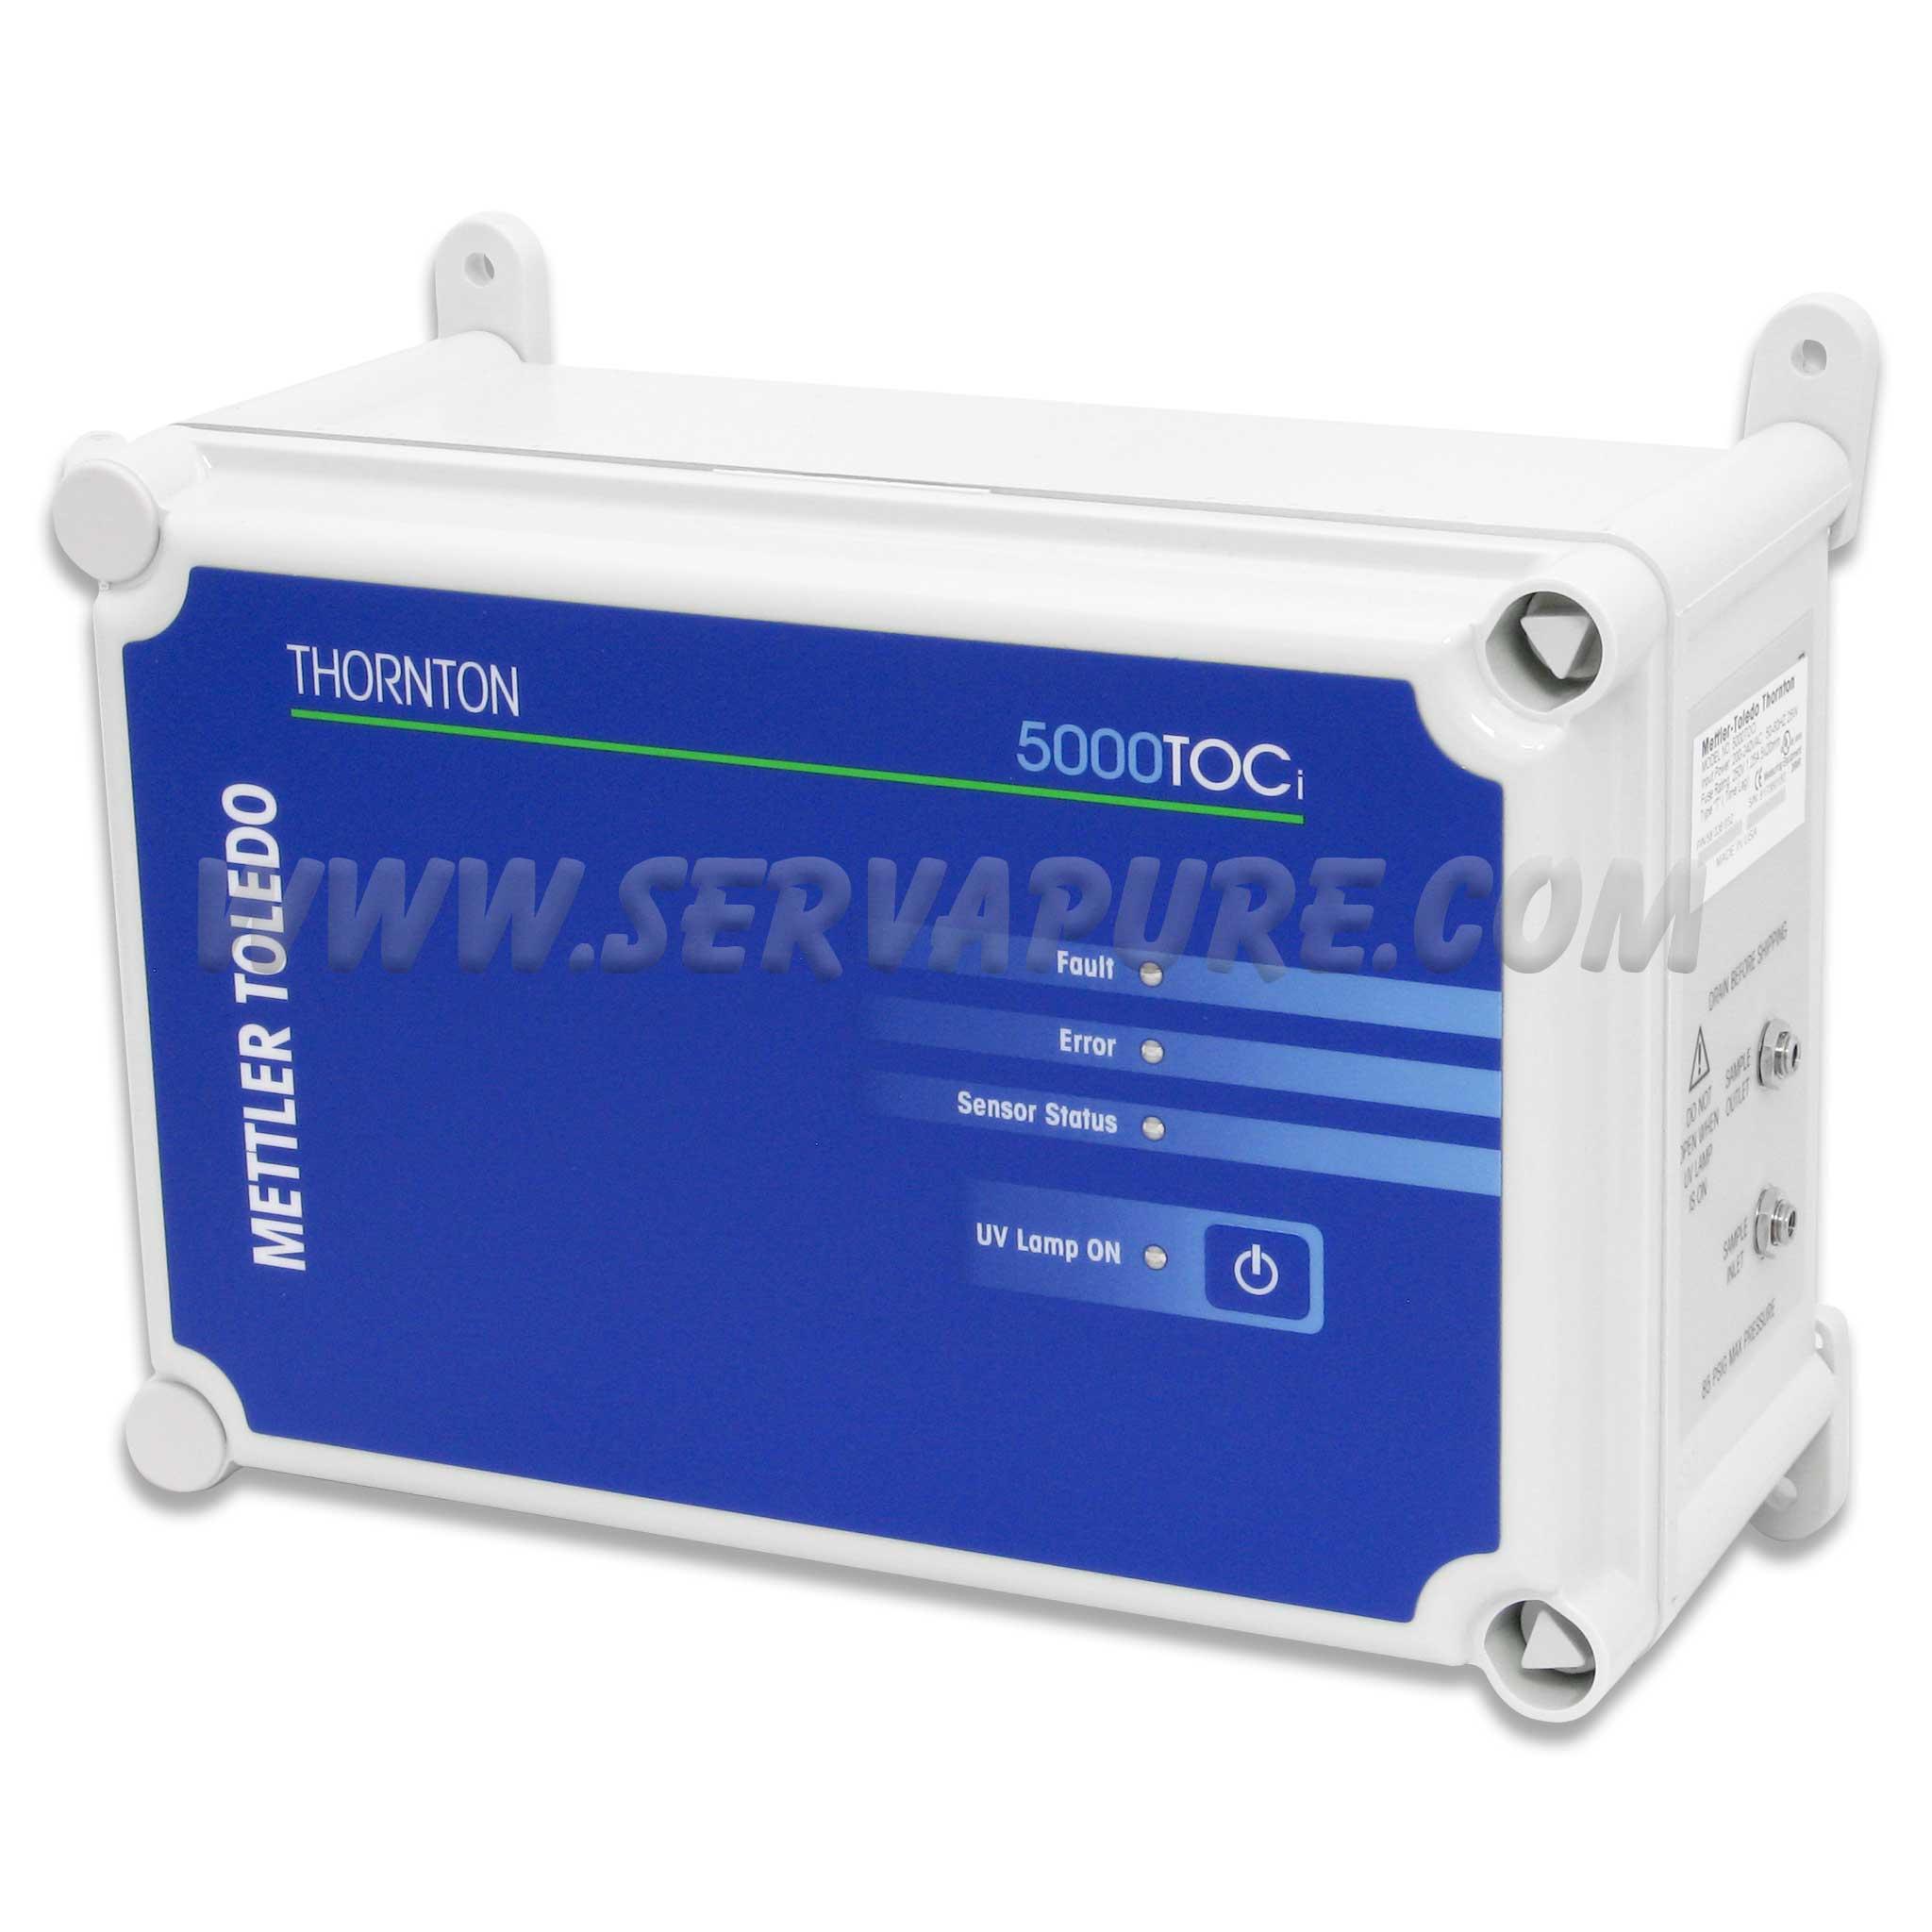 Thornton Hyundai: Thornton 5000TOCi Sensor 0.05-2000 PpbC TOC Analyzer